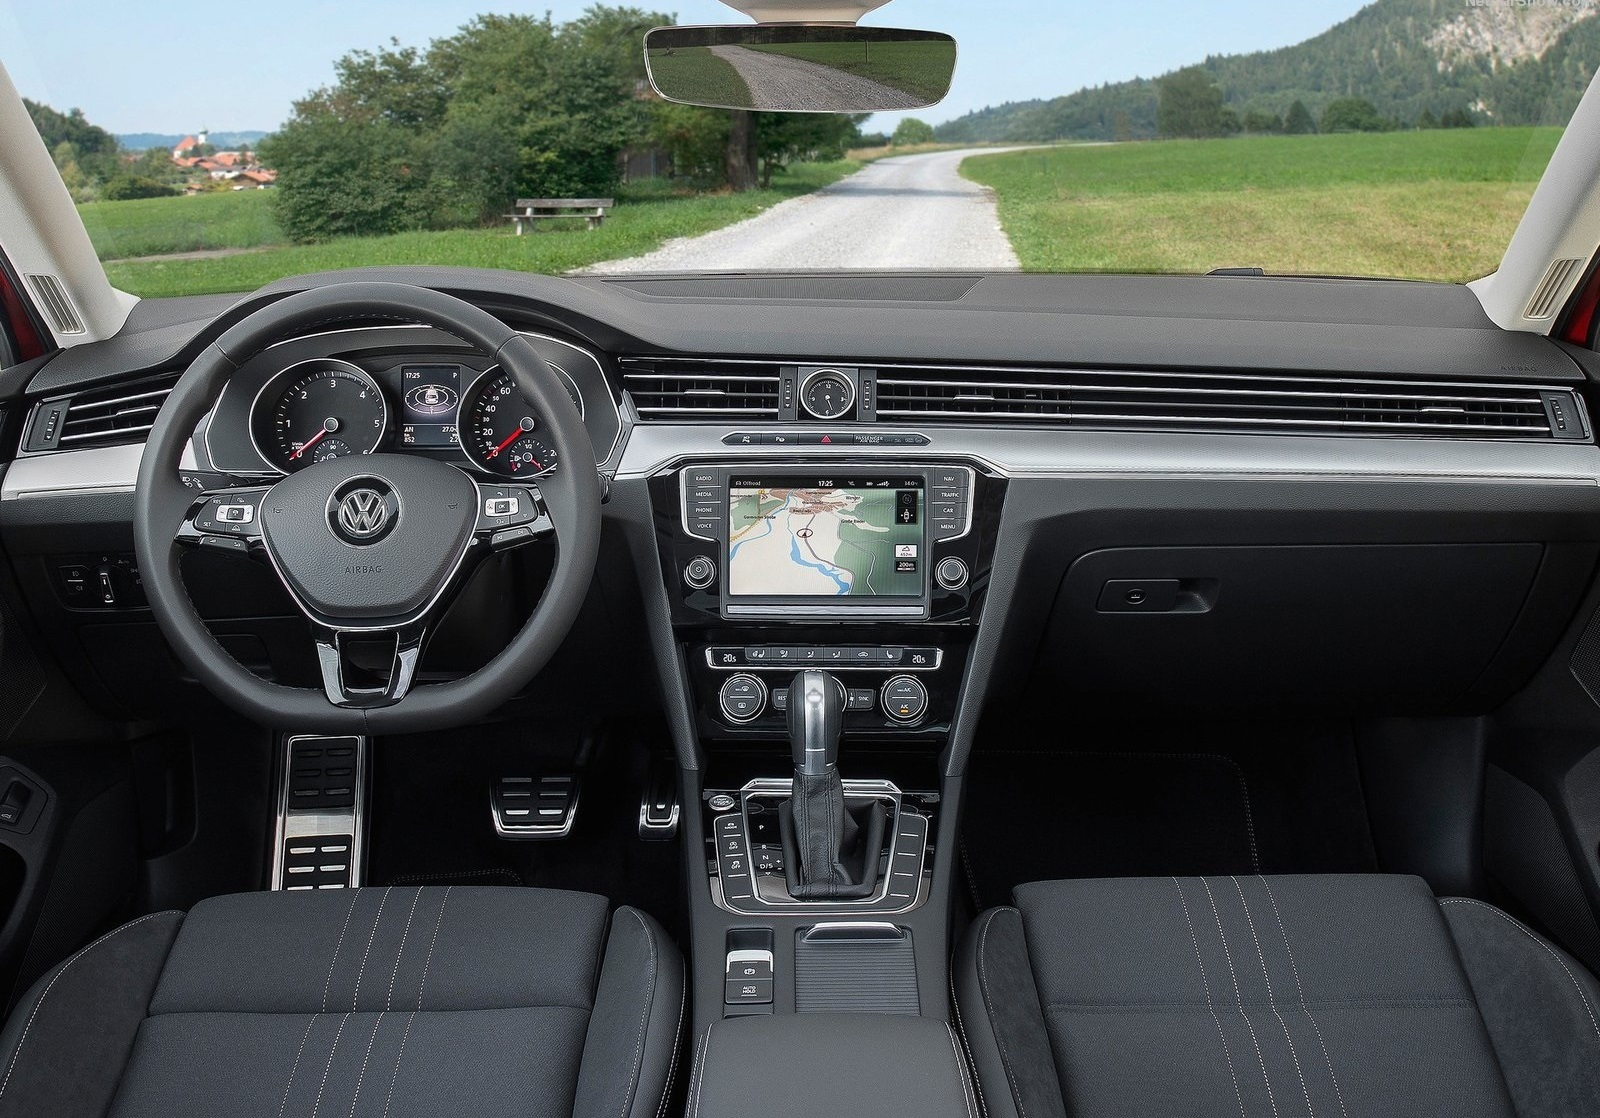 2016 Volkswagen Passat Alltrack Dashboard Interior